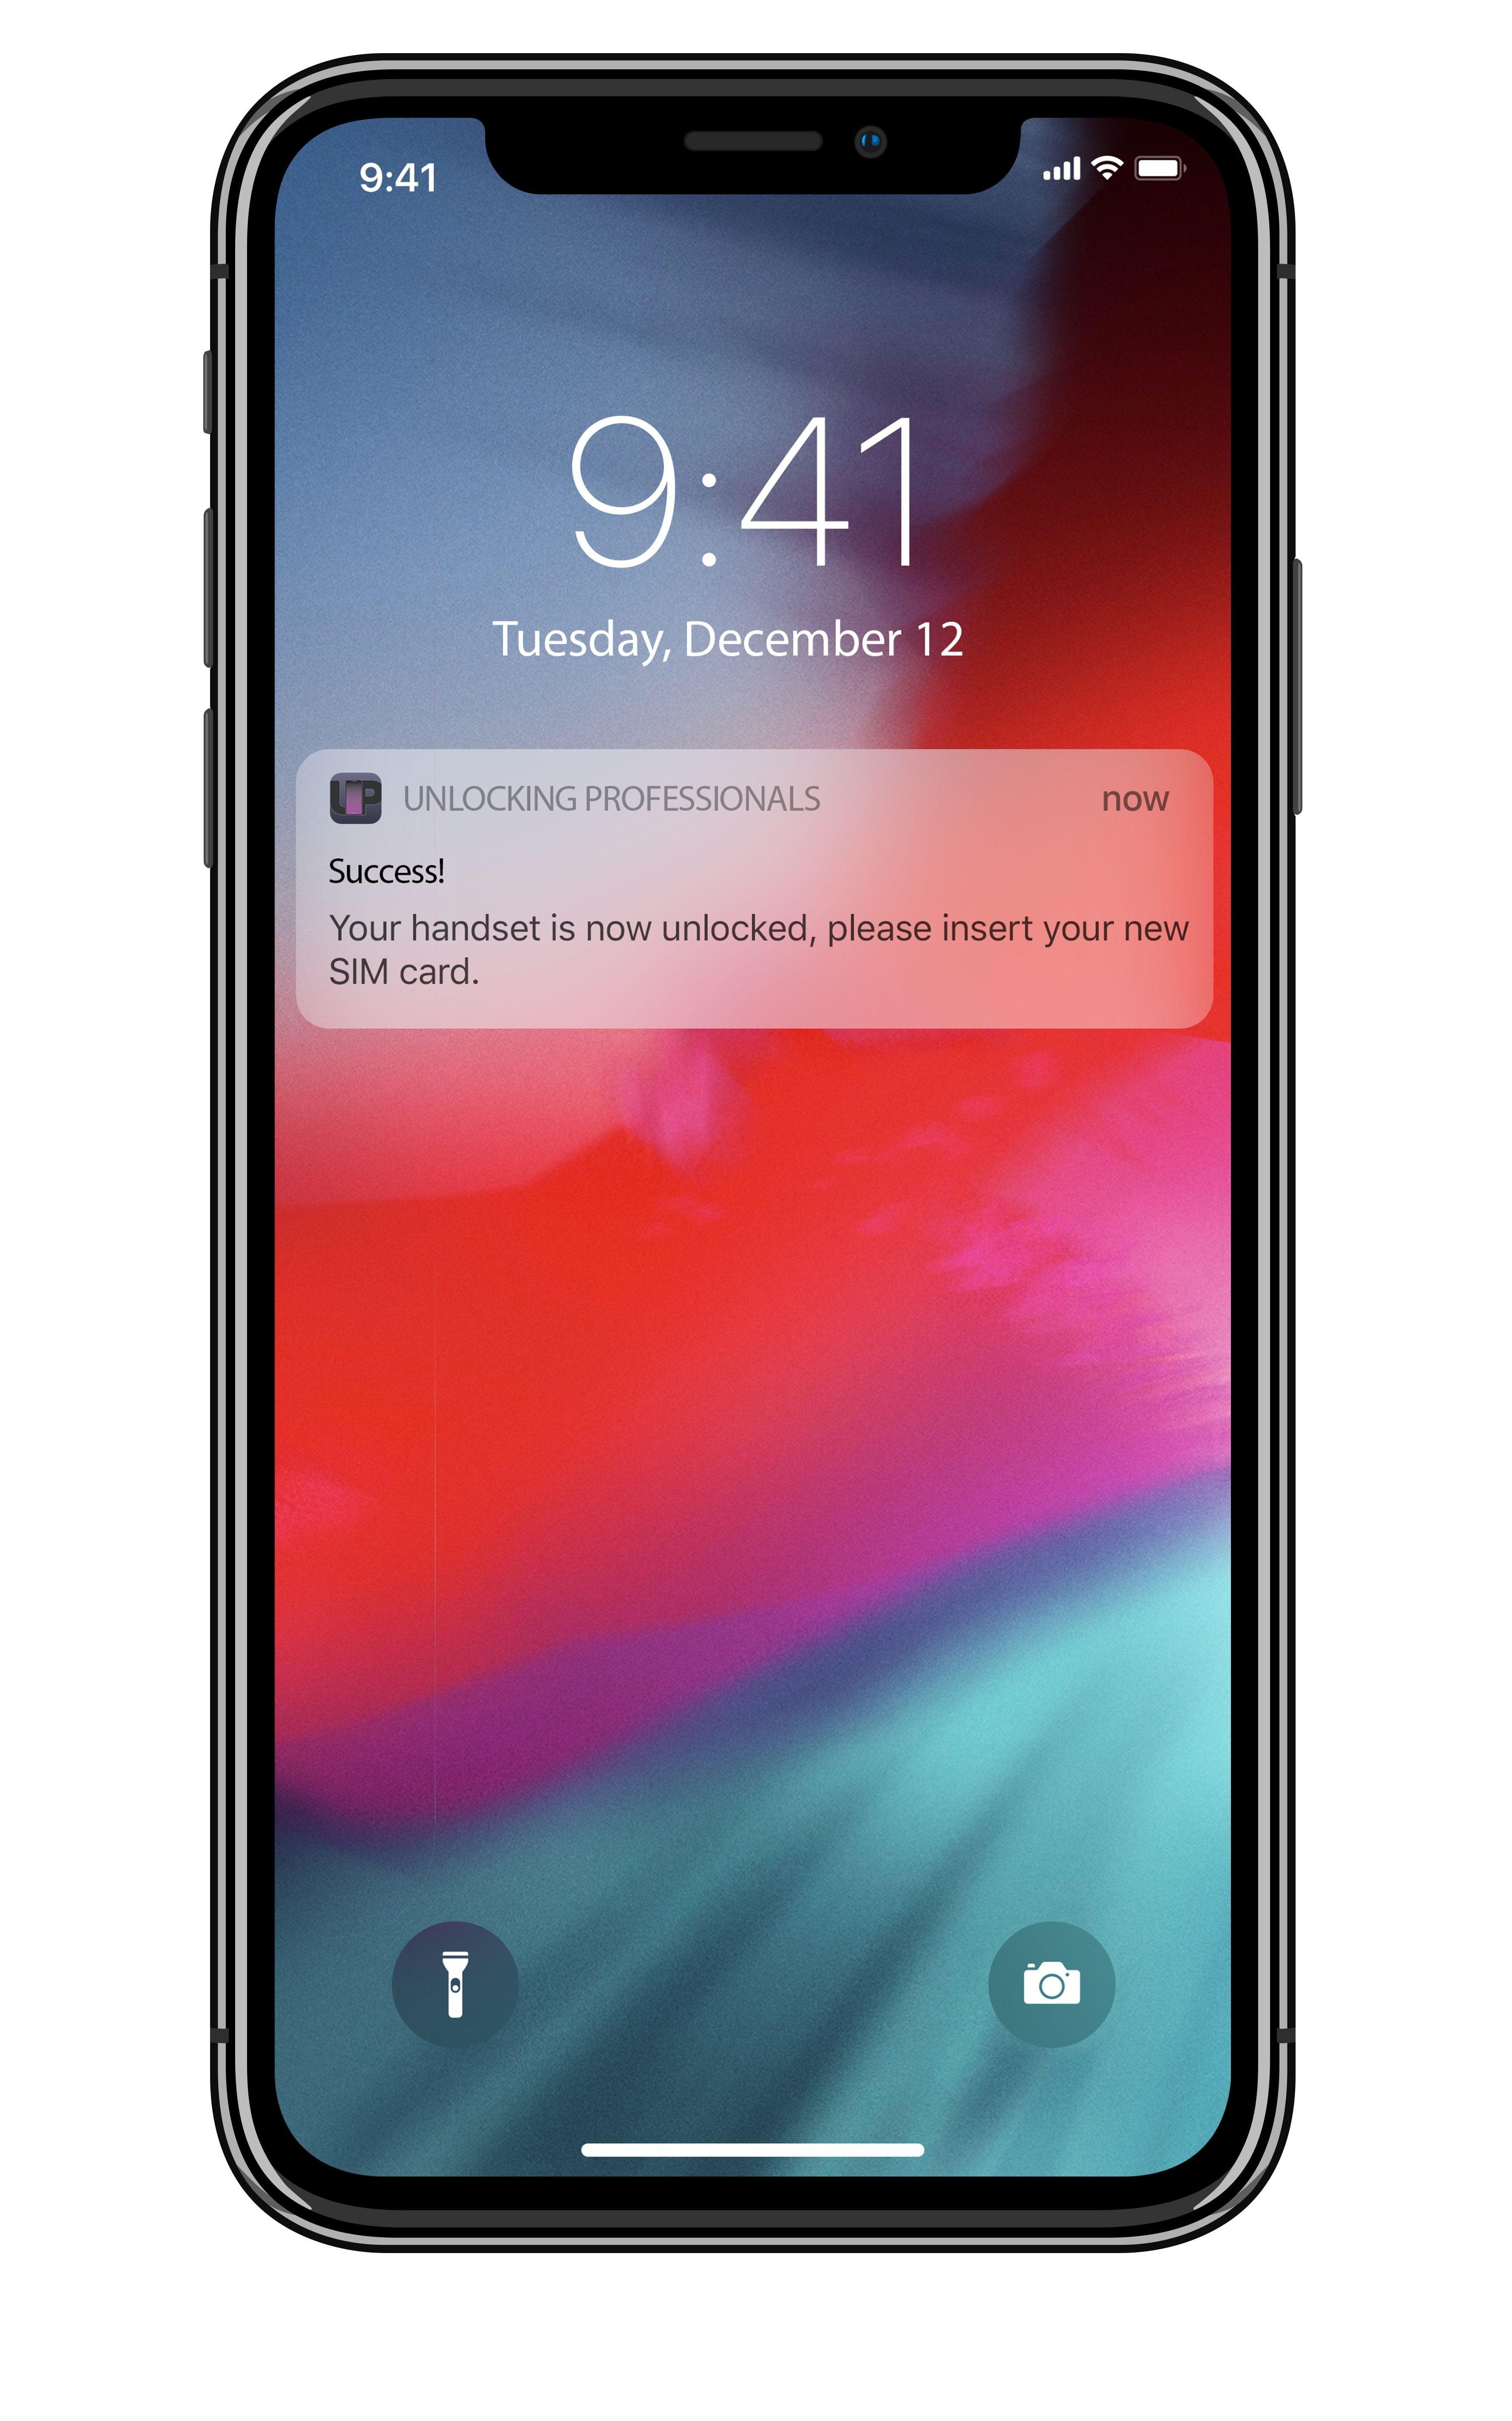 Official iPhone Unlock